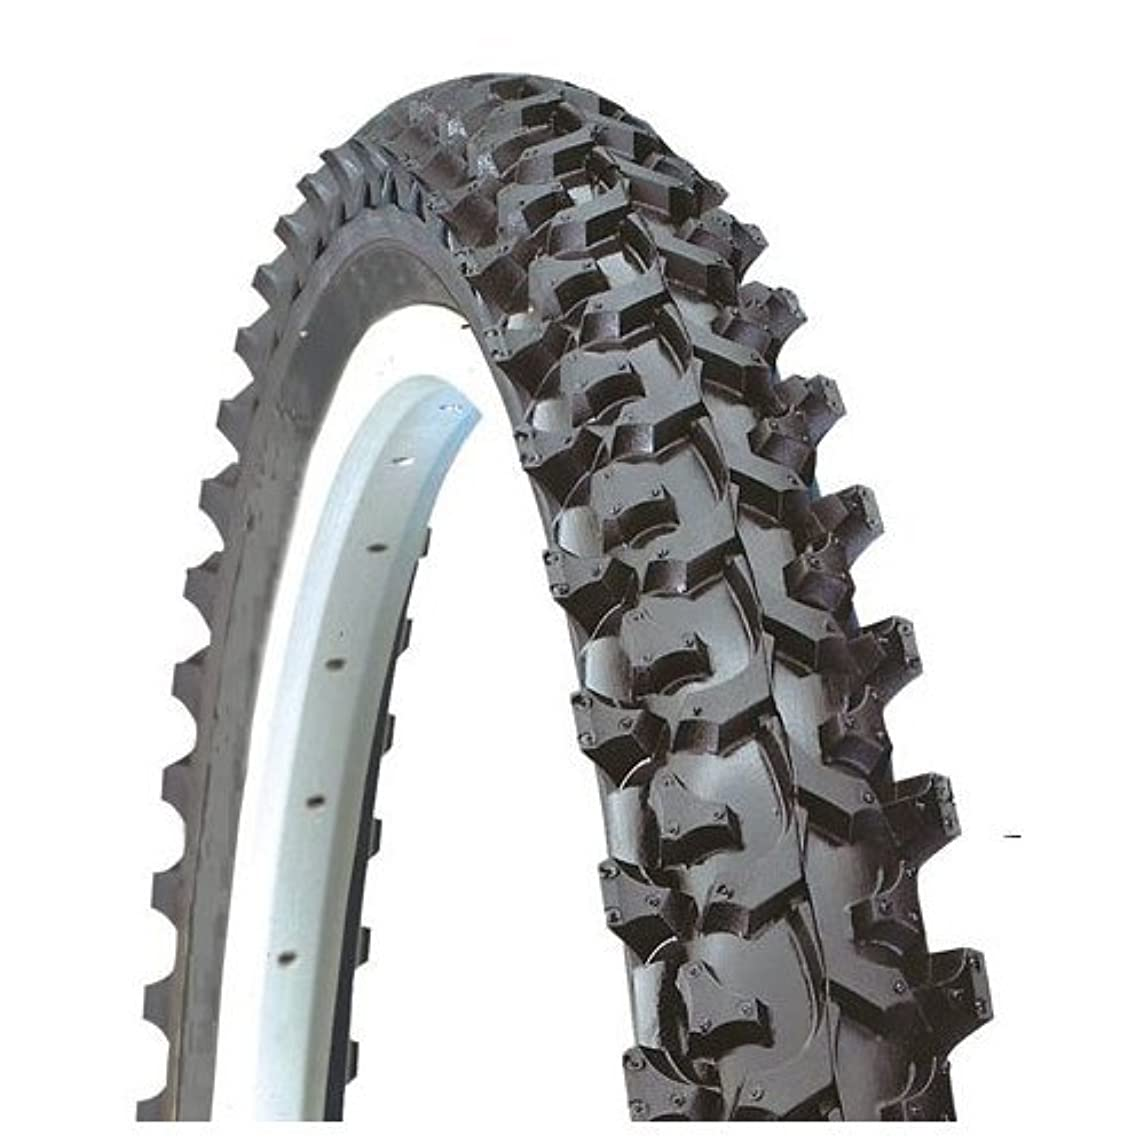 Kenda K850 Aggressive MTB Wire Bead Bicycle Tire, Blackskin, 26-Inch x 2.10-Inch